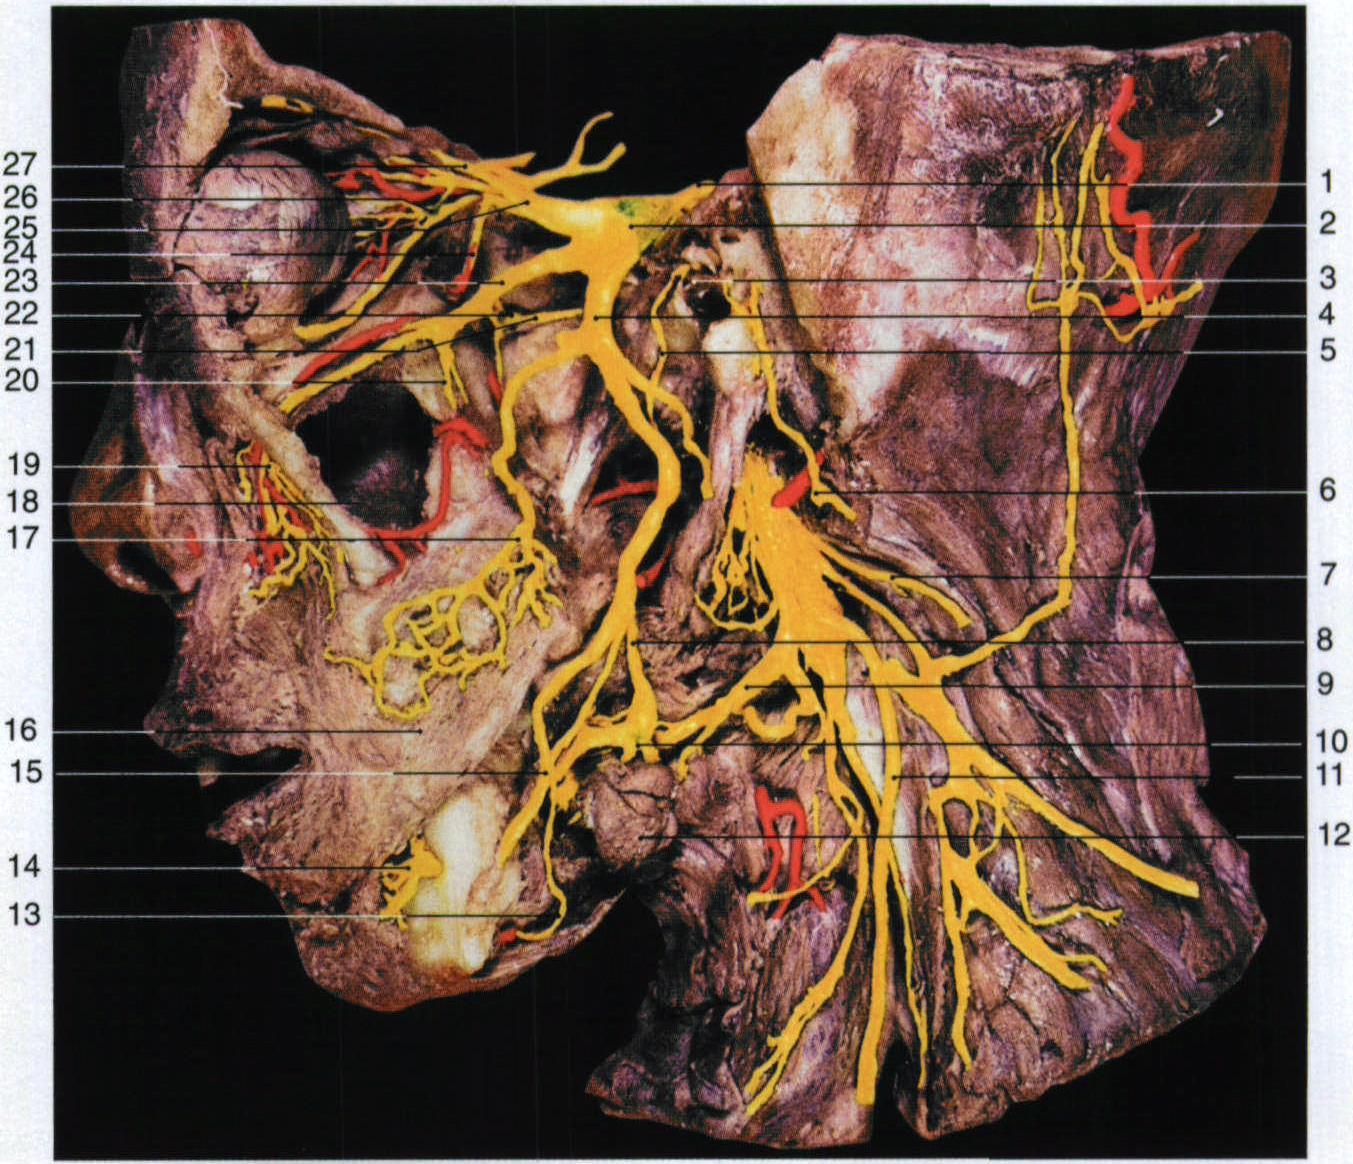 三叉神经(外侧面观) : 1. 三叉神经trigeminal n.2. 三叉神经节trigeminal ganglion3. 鼓膜tympanic membrane4. 下颌神经mandibular n.5. 鼓索chorda tympani6. 面神经facial n.7. 副神经accessory n.8. 舌神经lingual n.9. 舌下神经hypoglossal n.10. 下颌下神经节submandibu .